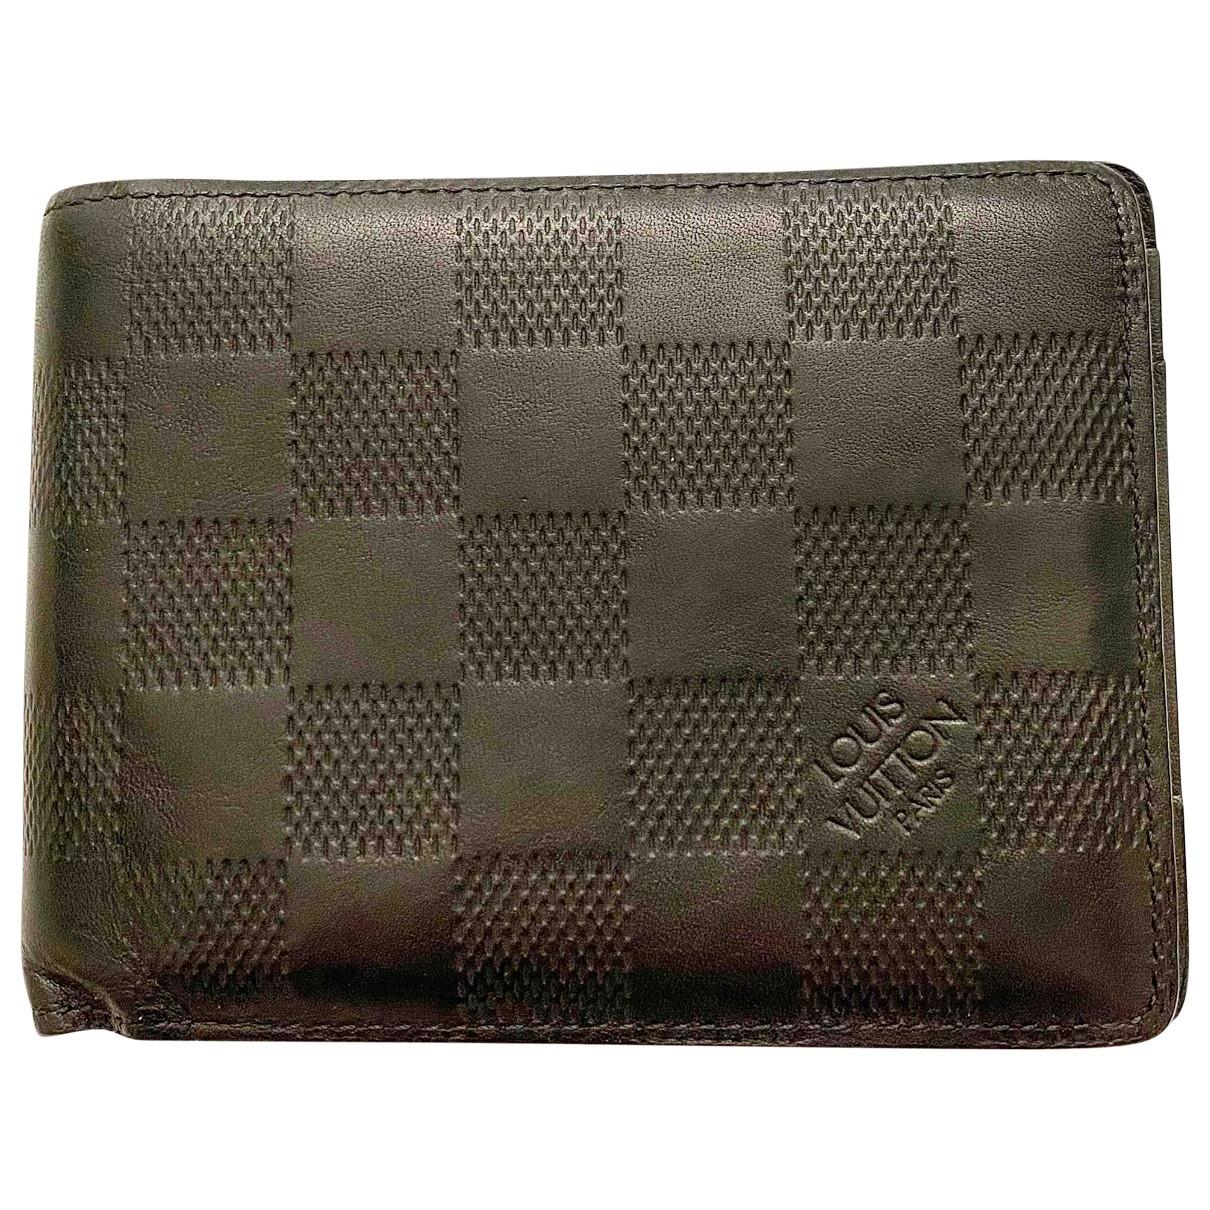 Louis Vuitton Multiple Kleinlederwaren in  Schwarz Leder